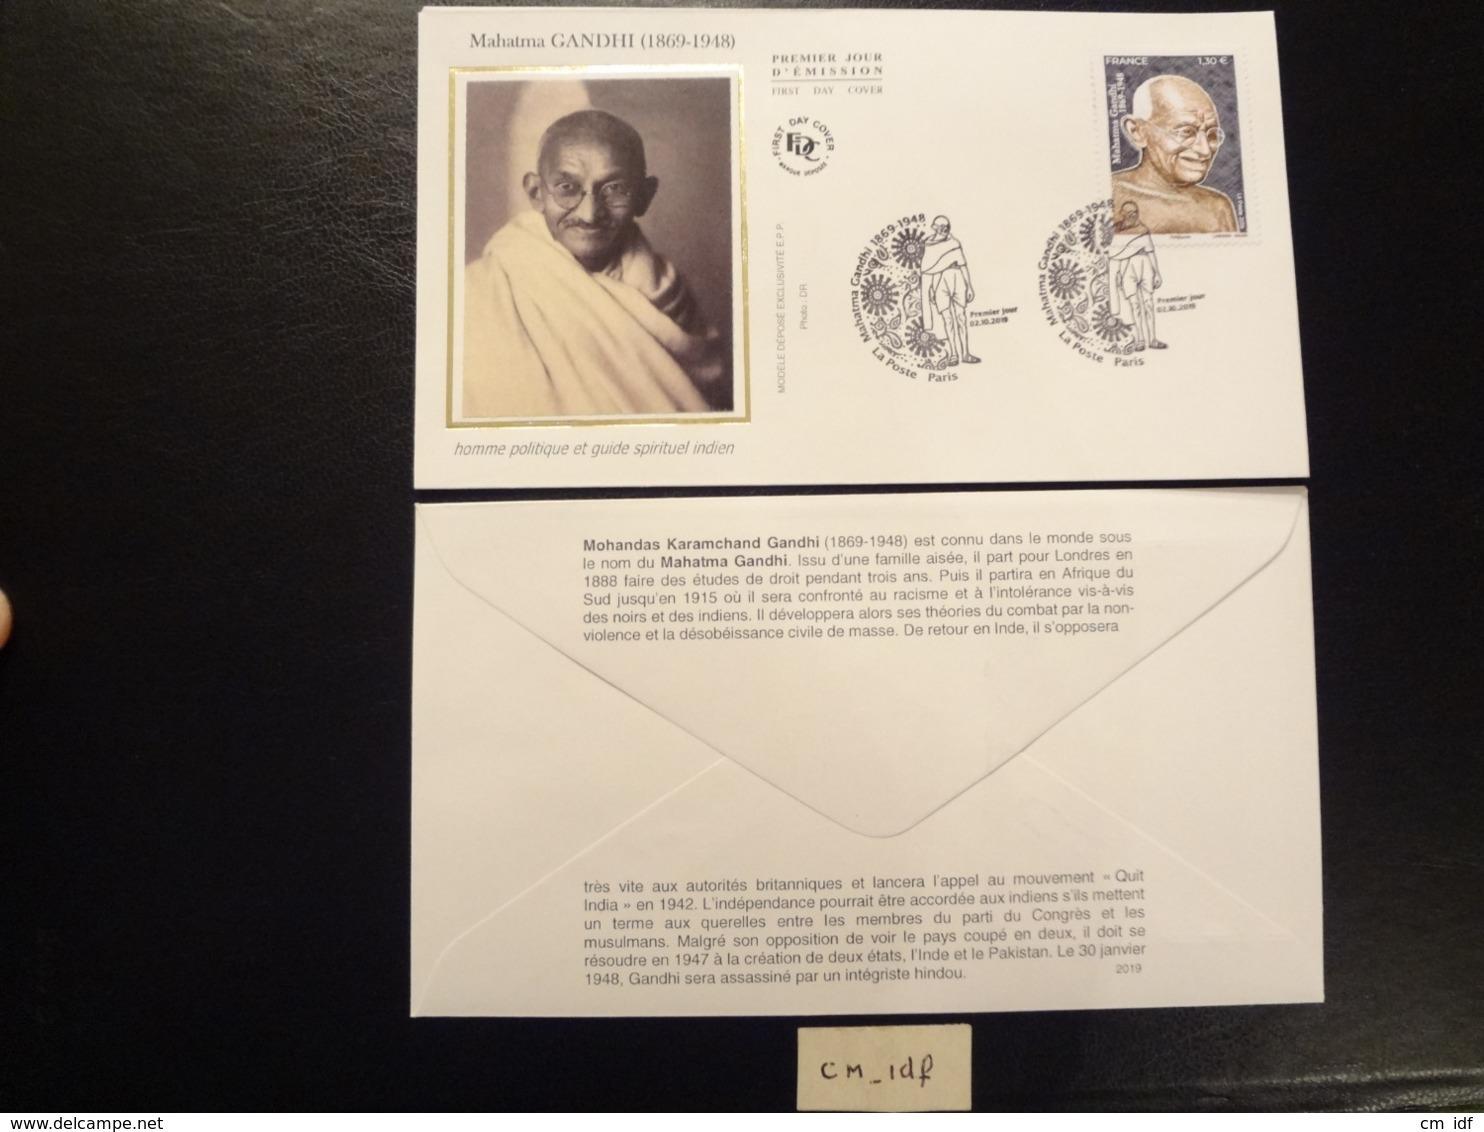 FRANCE 2019 1,30 MAHATMA GANDHI 1869 - 1948 , OBLITERATION PREMIER JOUR 02.10.2019 ENVELOPPE F.D.C. - FDC